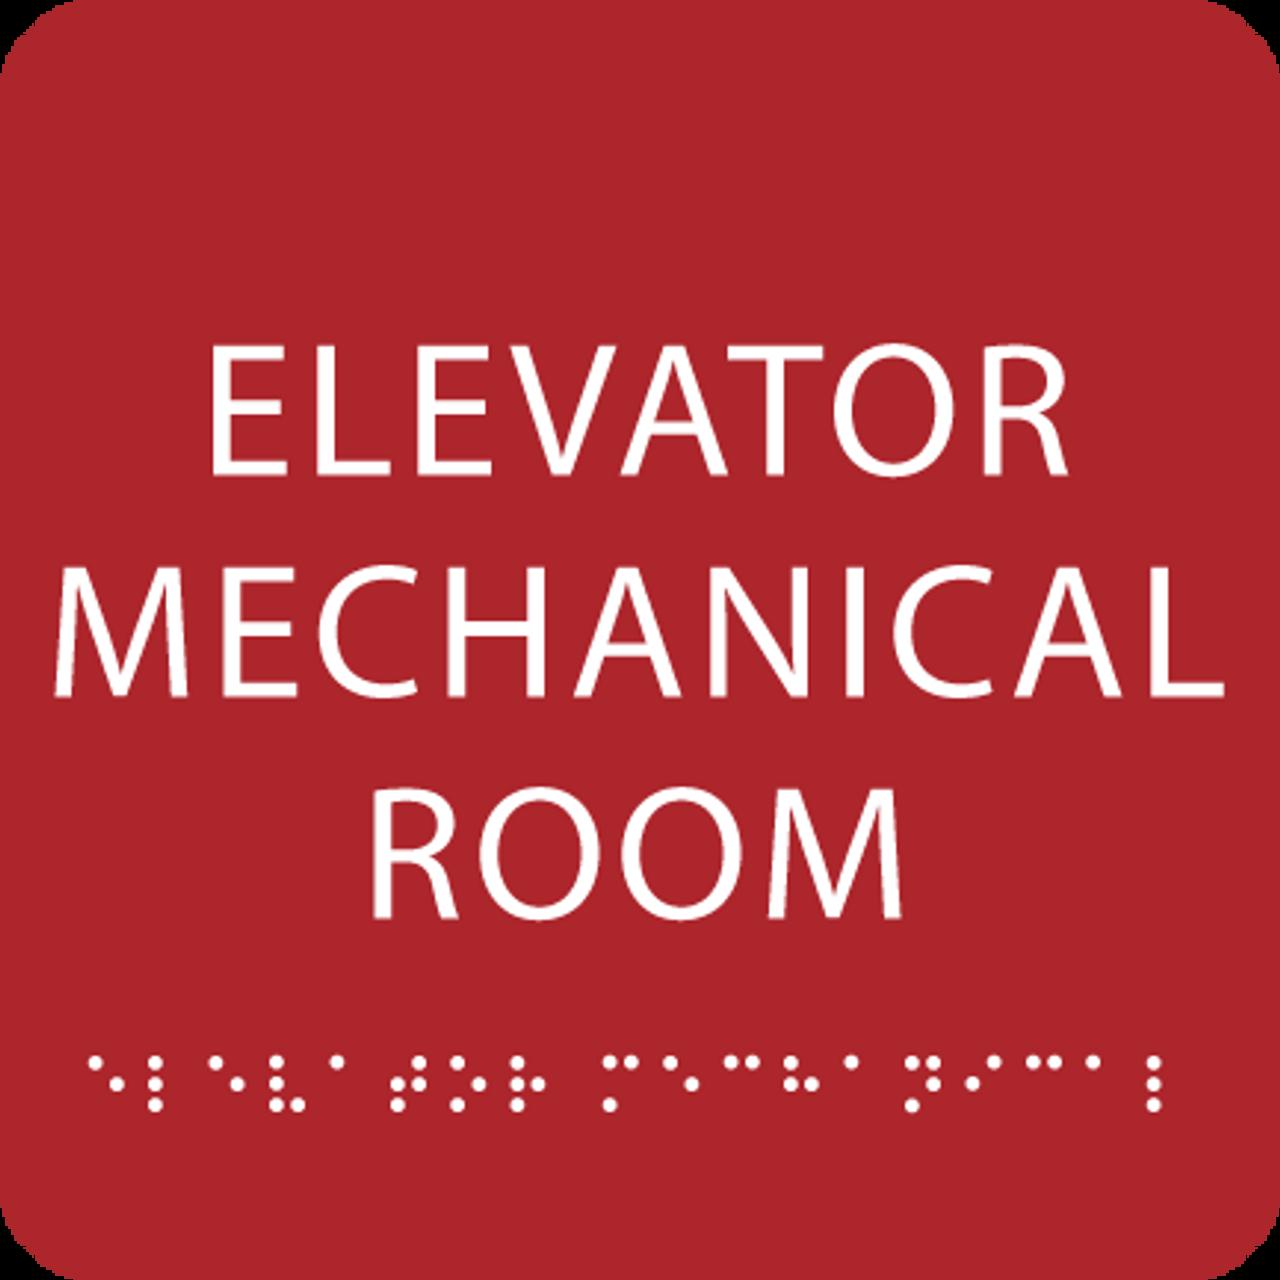 Red Elevator Mechanical Room ADA Sign